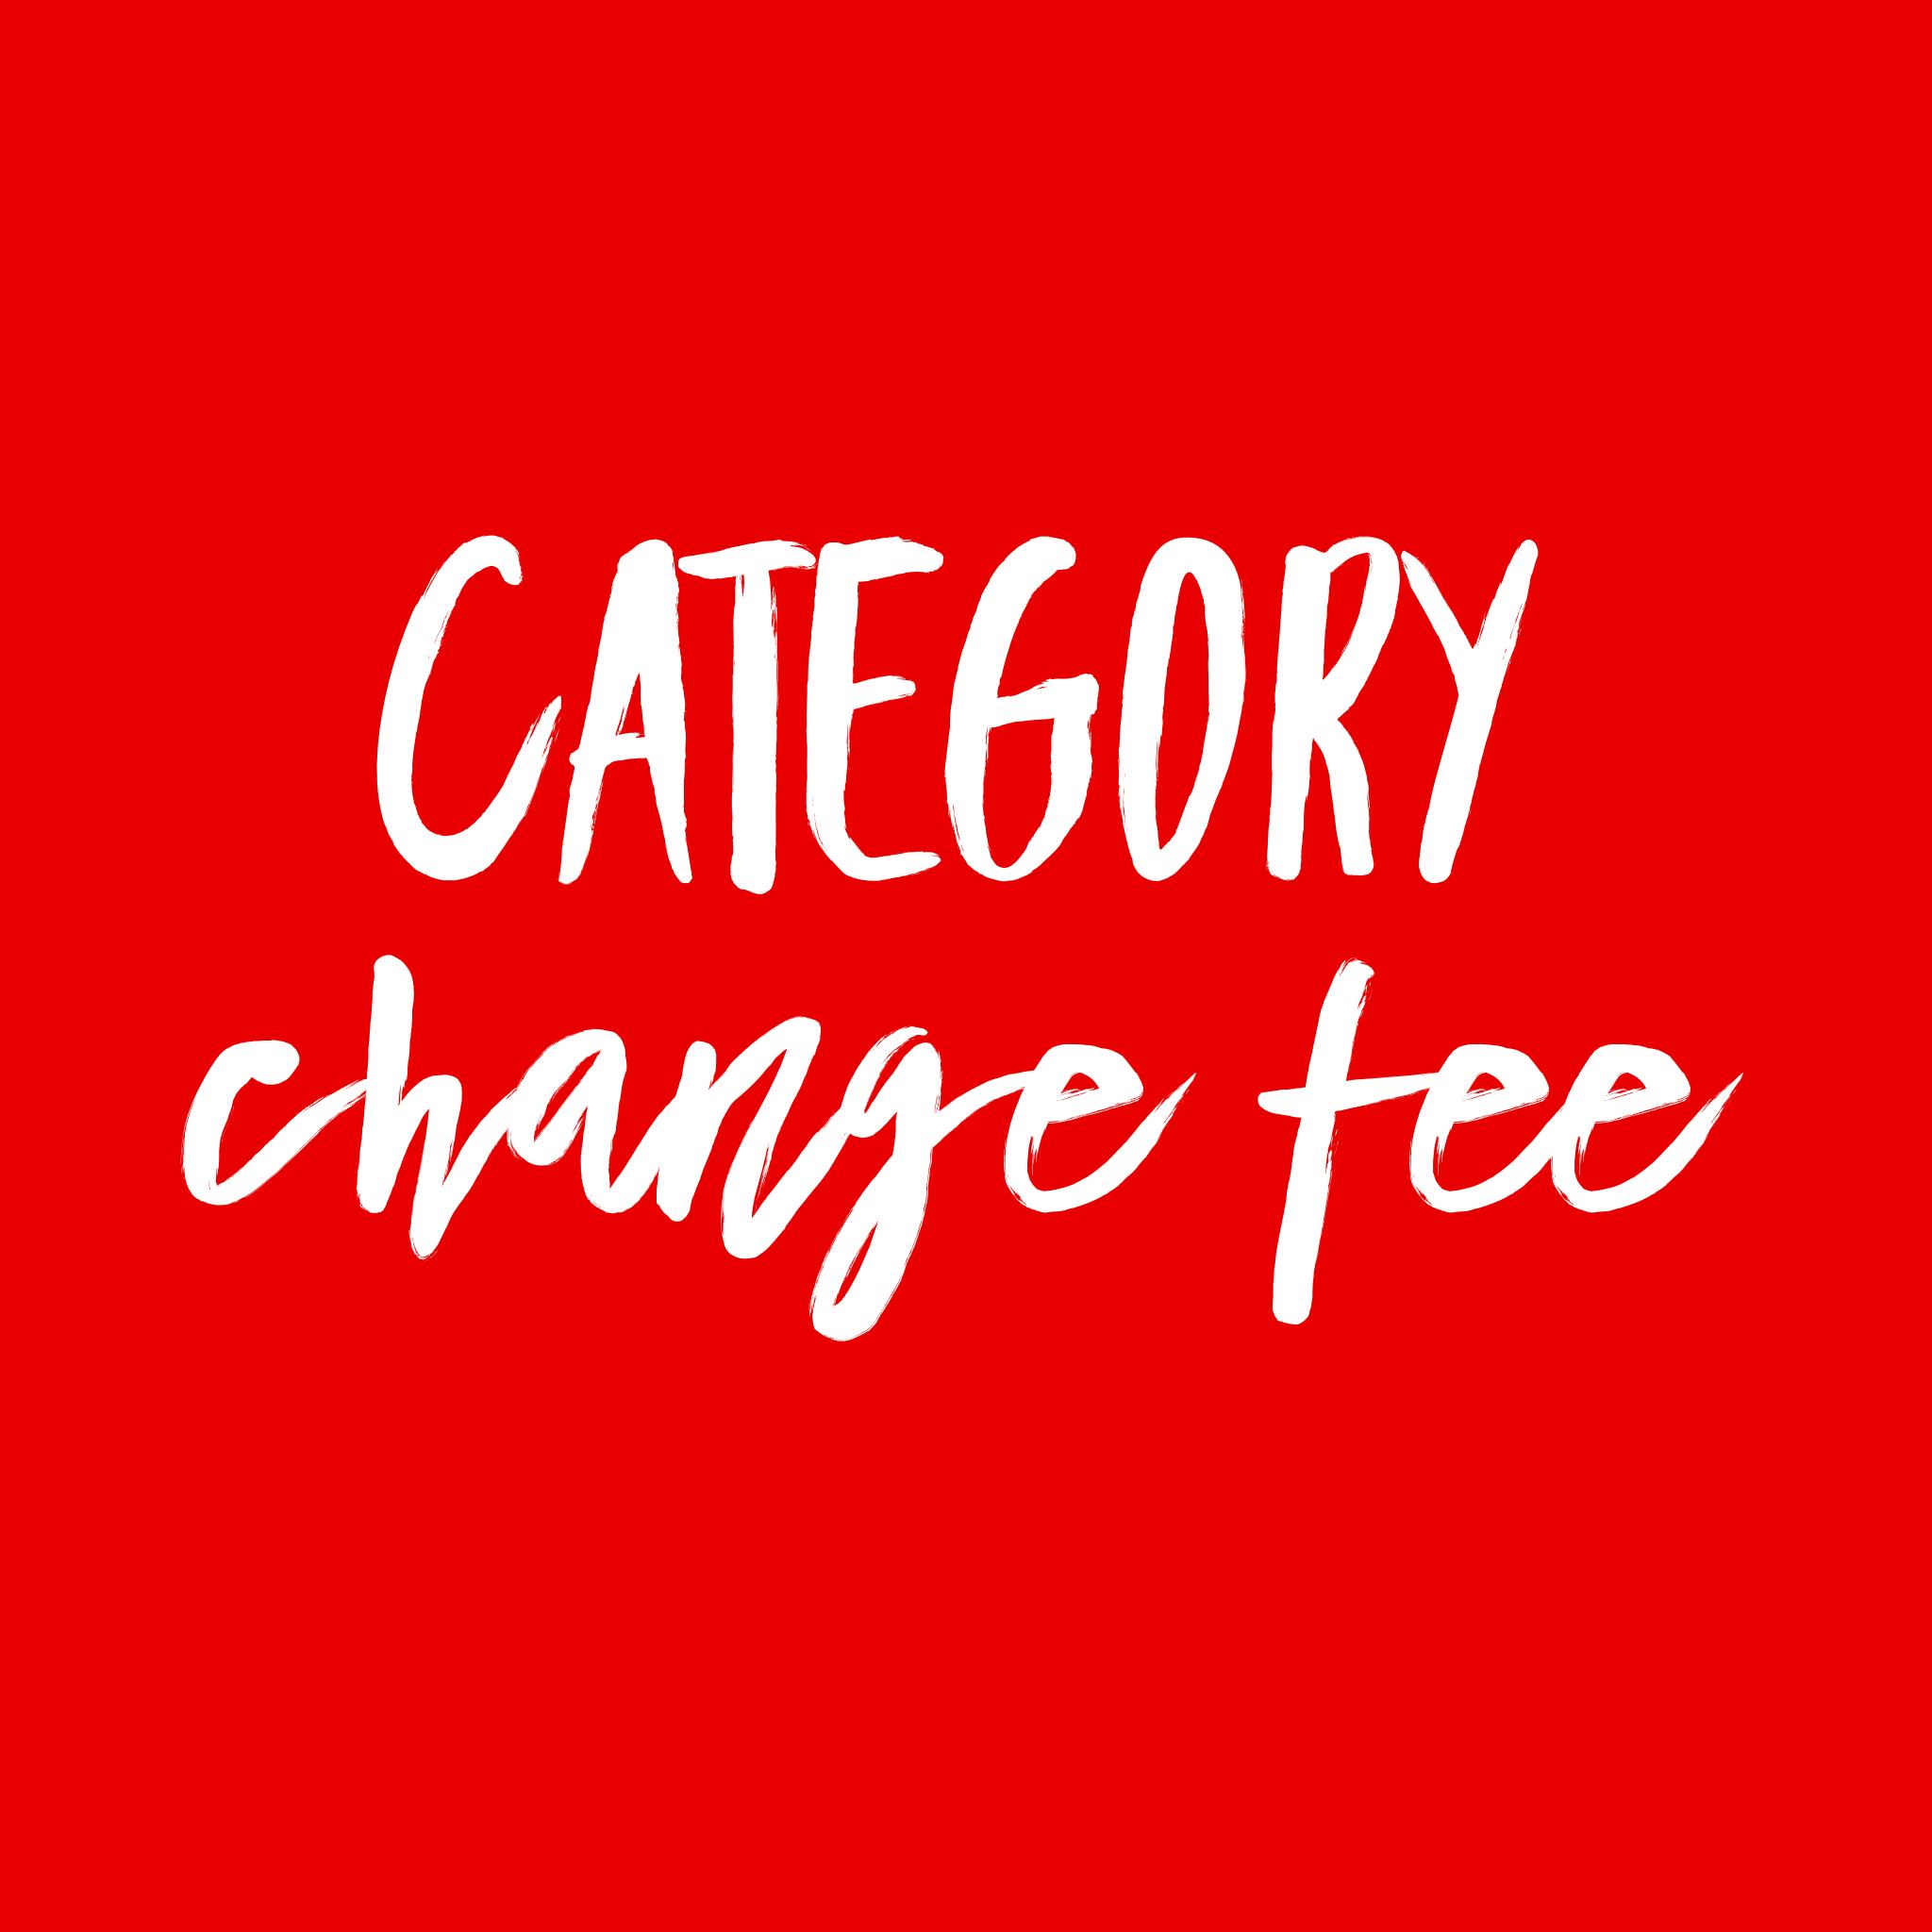 CATEGORY CHANGE FEE